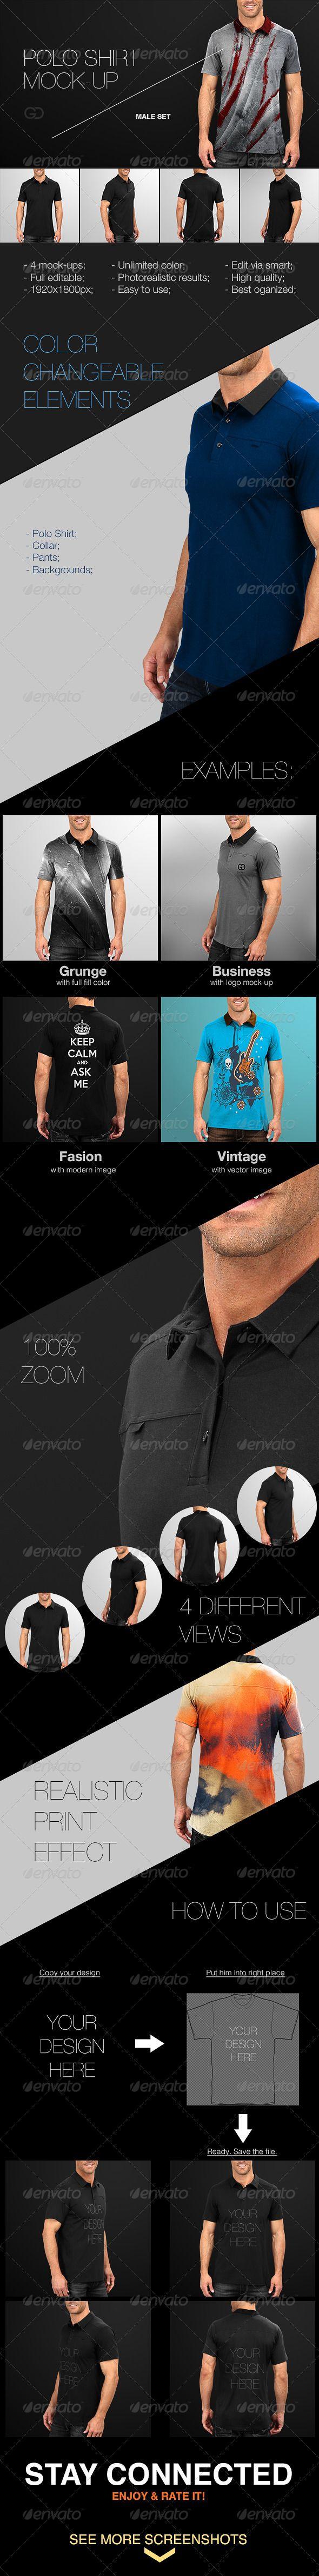 Shirt design photoshop template - Mens Polo Shirt Mock Up Men S Polo Shirtsmockupshirt Designsphotoshoptemplatesdownload